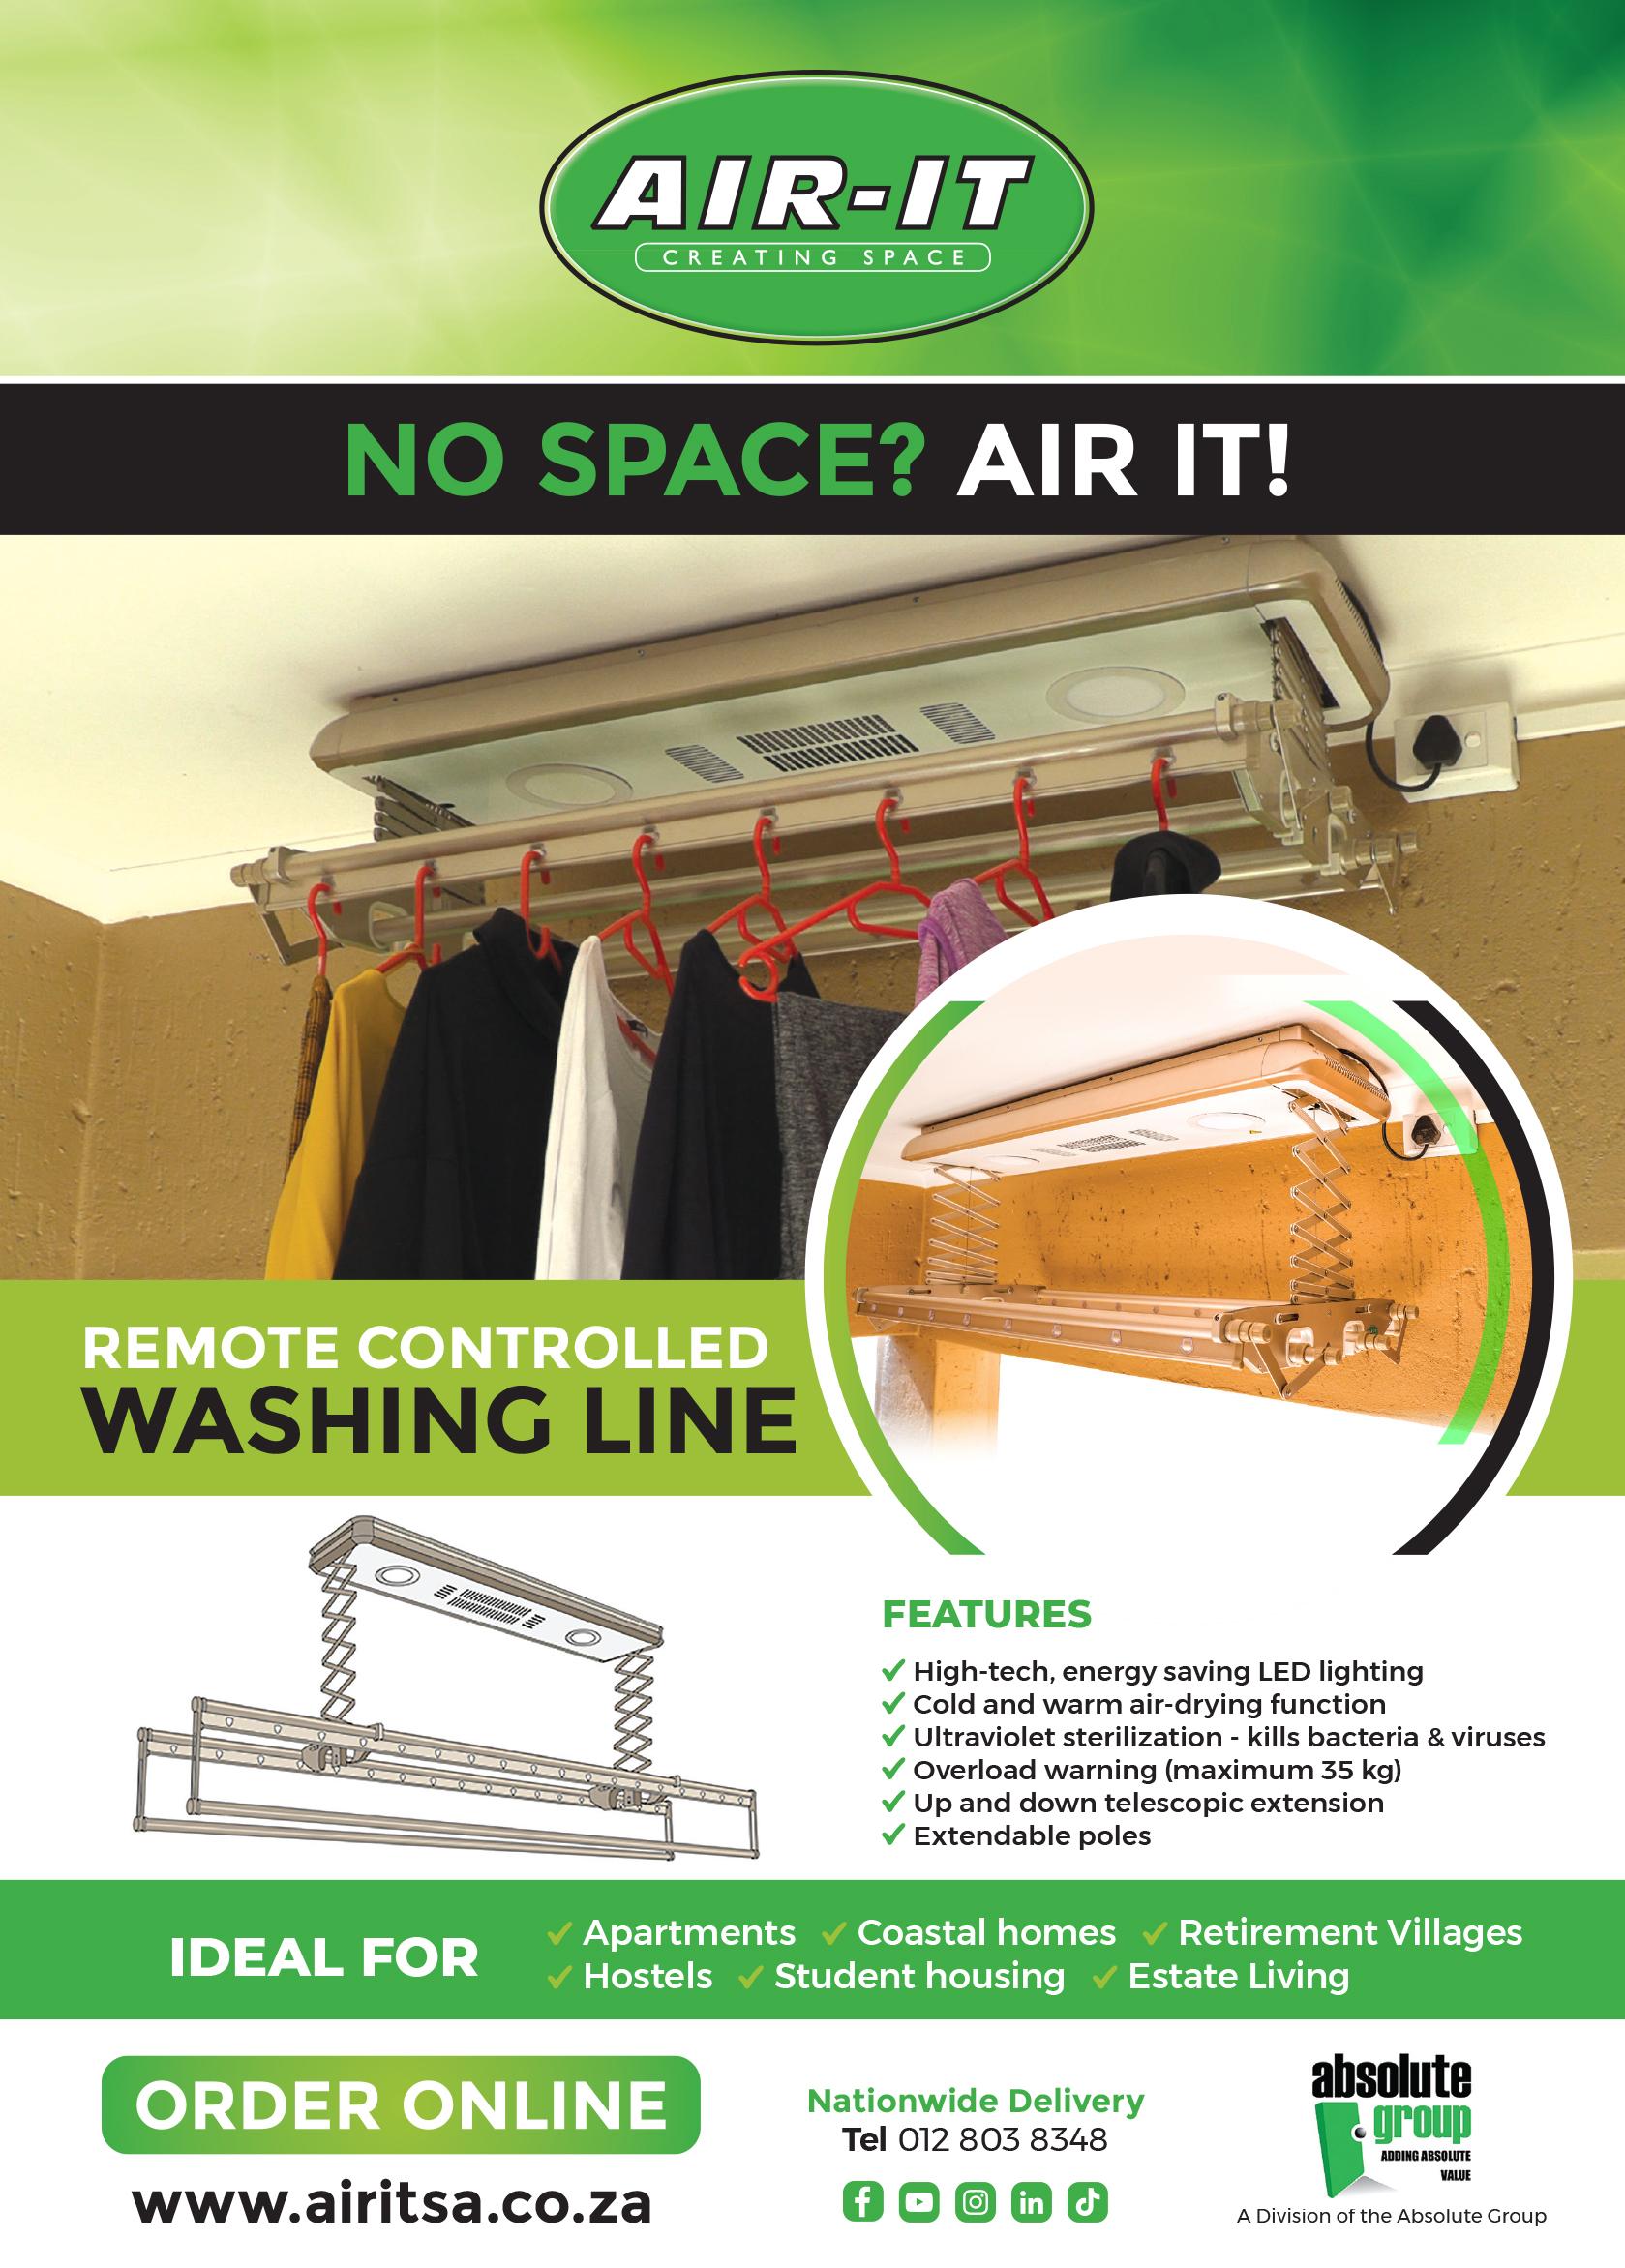 Air-It Multi-Purpose Storage and Washing Line Lift